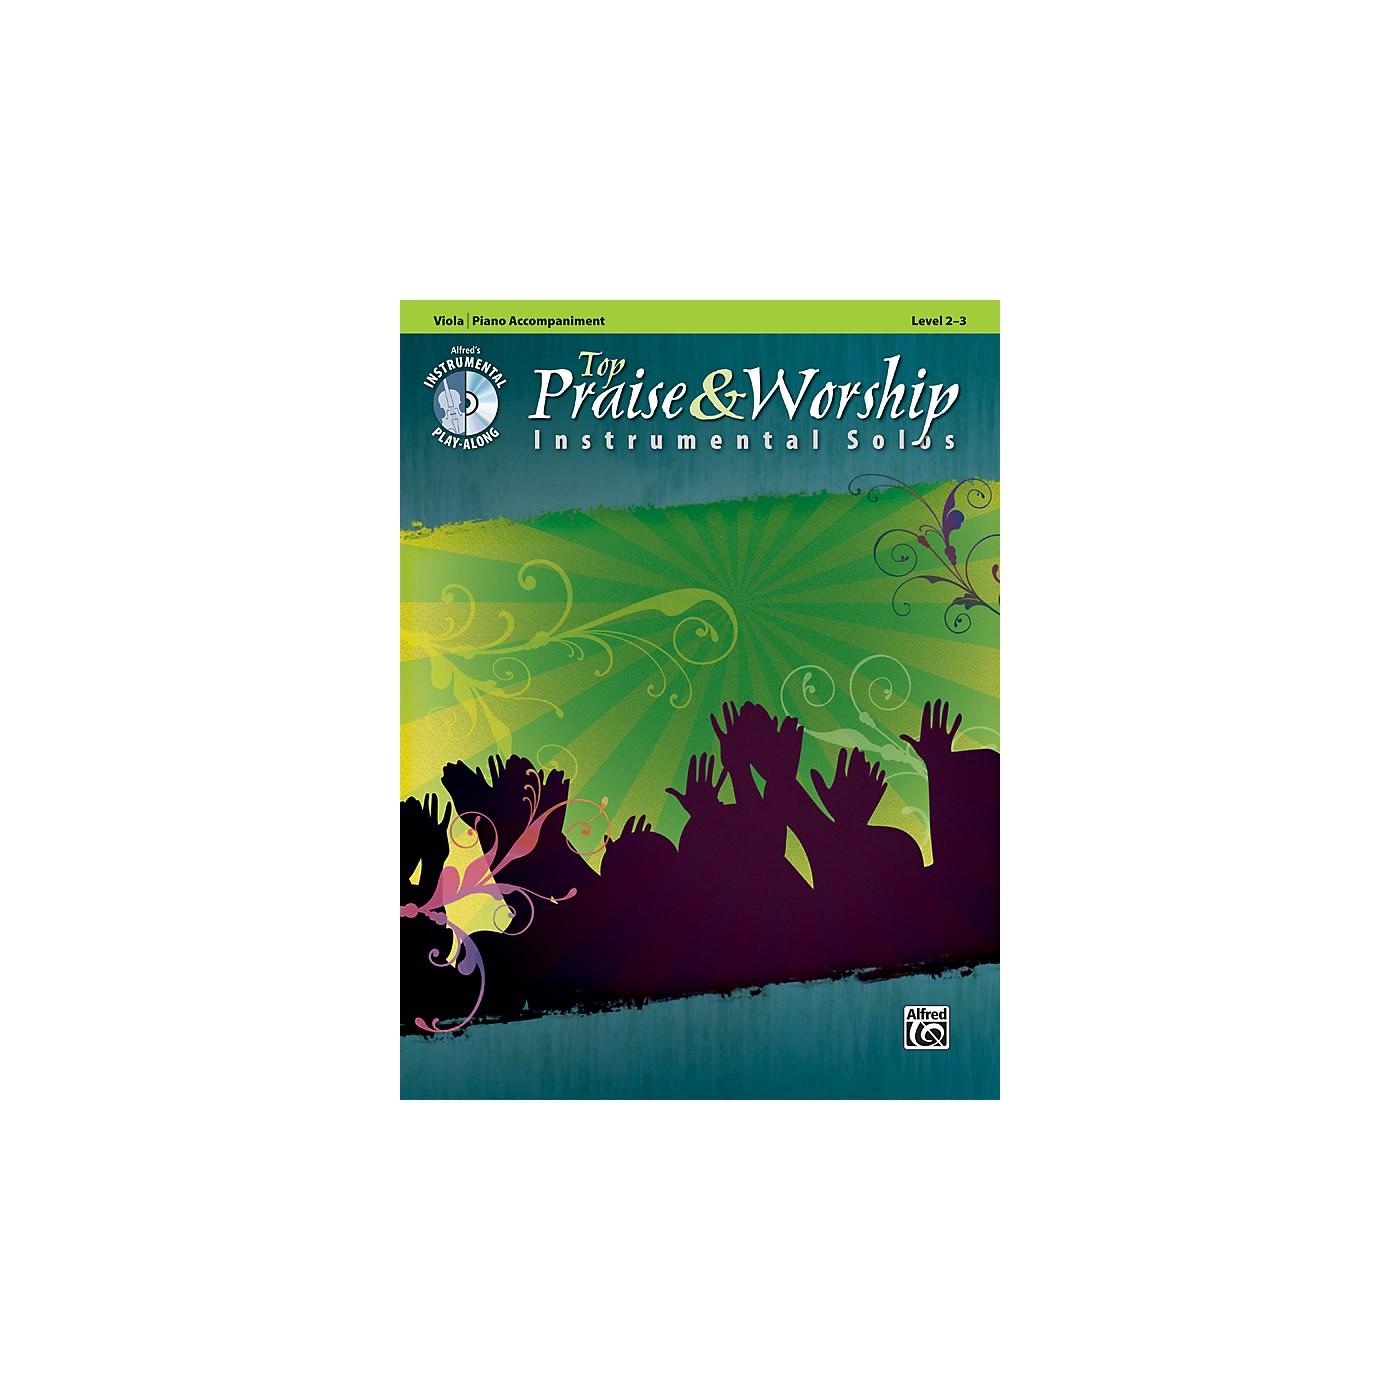 Alfred Top Praise & Worship Instrumental Solos - Viola, Level 2-3 (Book/CD) thumbnail